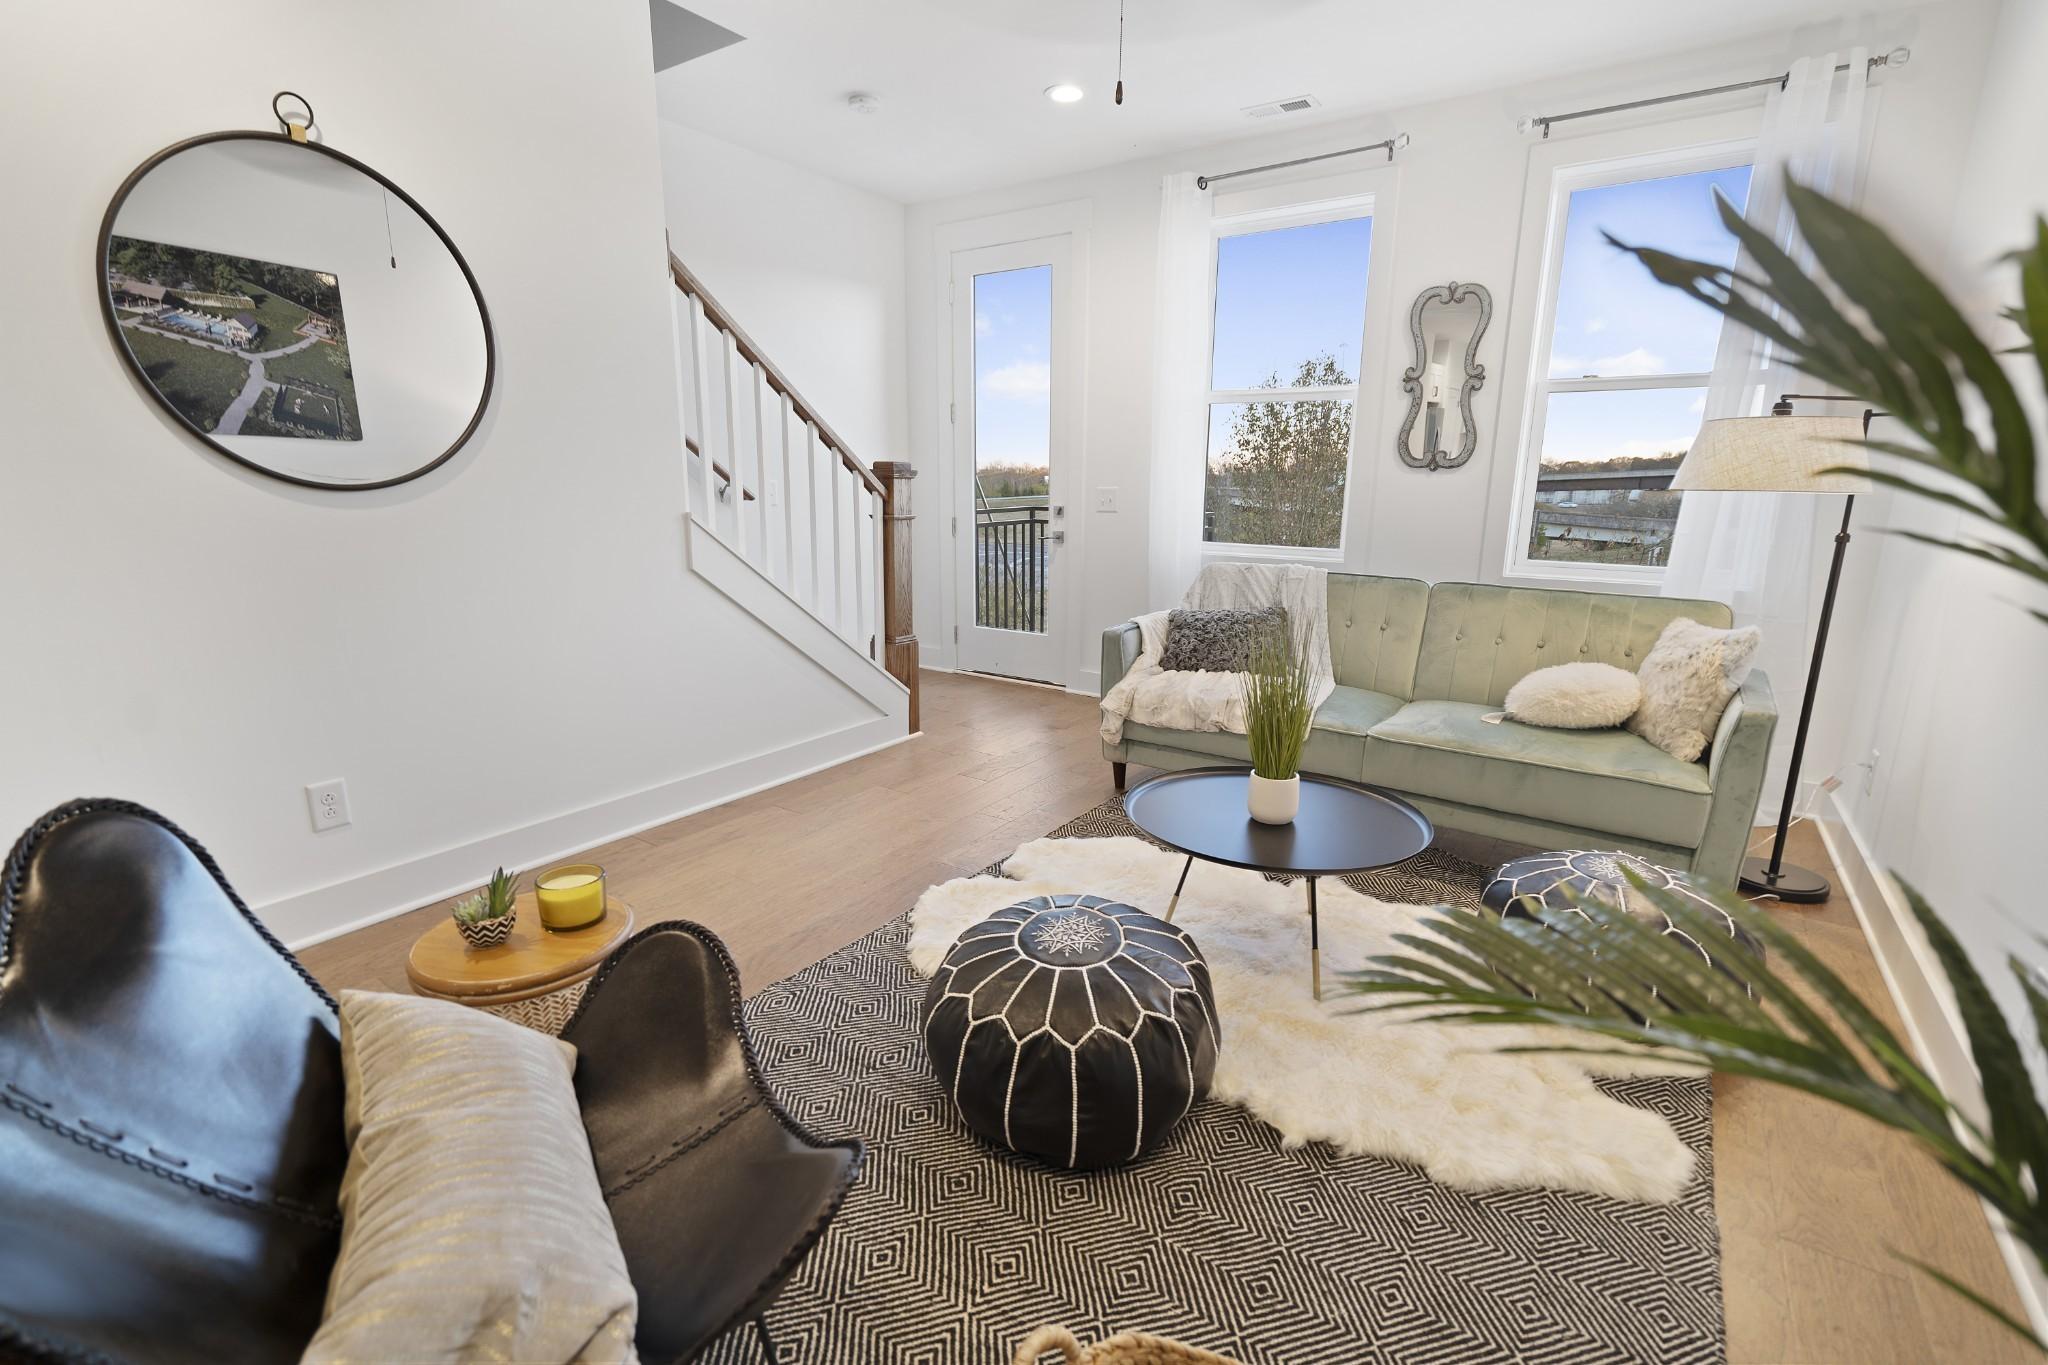 724 Inspiration Blvd Property Photo - Madison, TN real estate listing